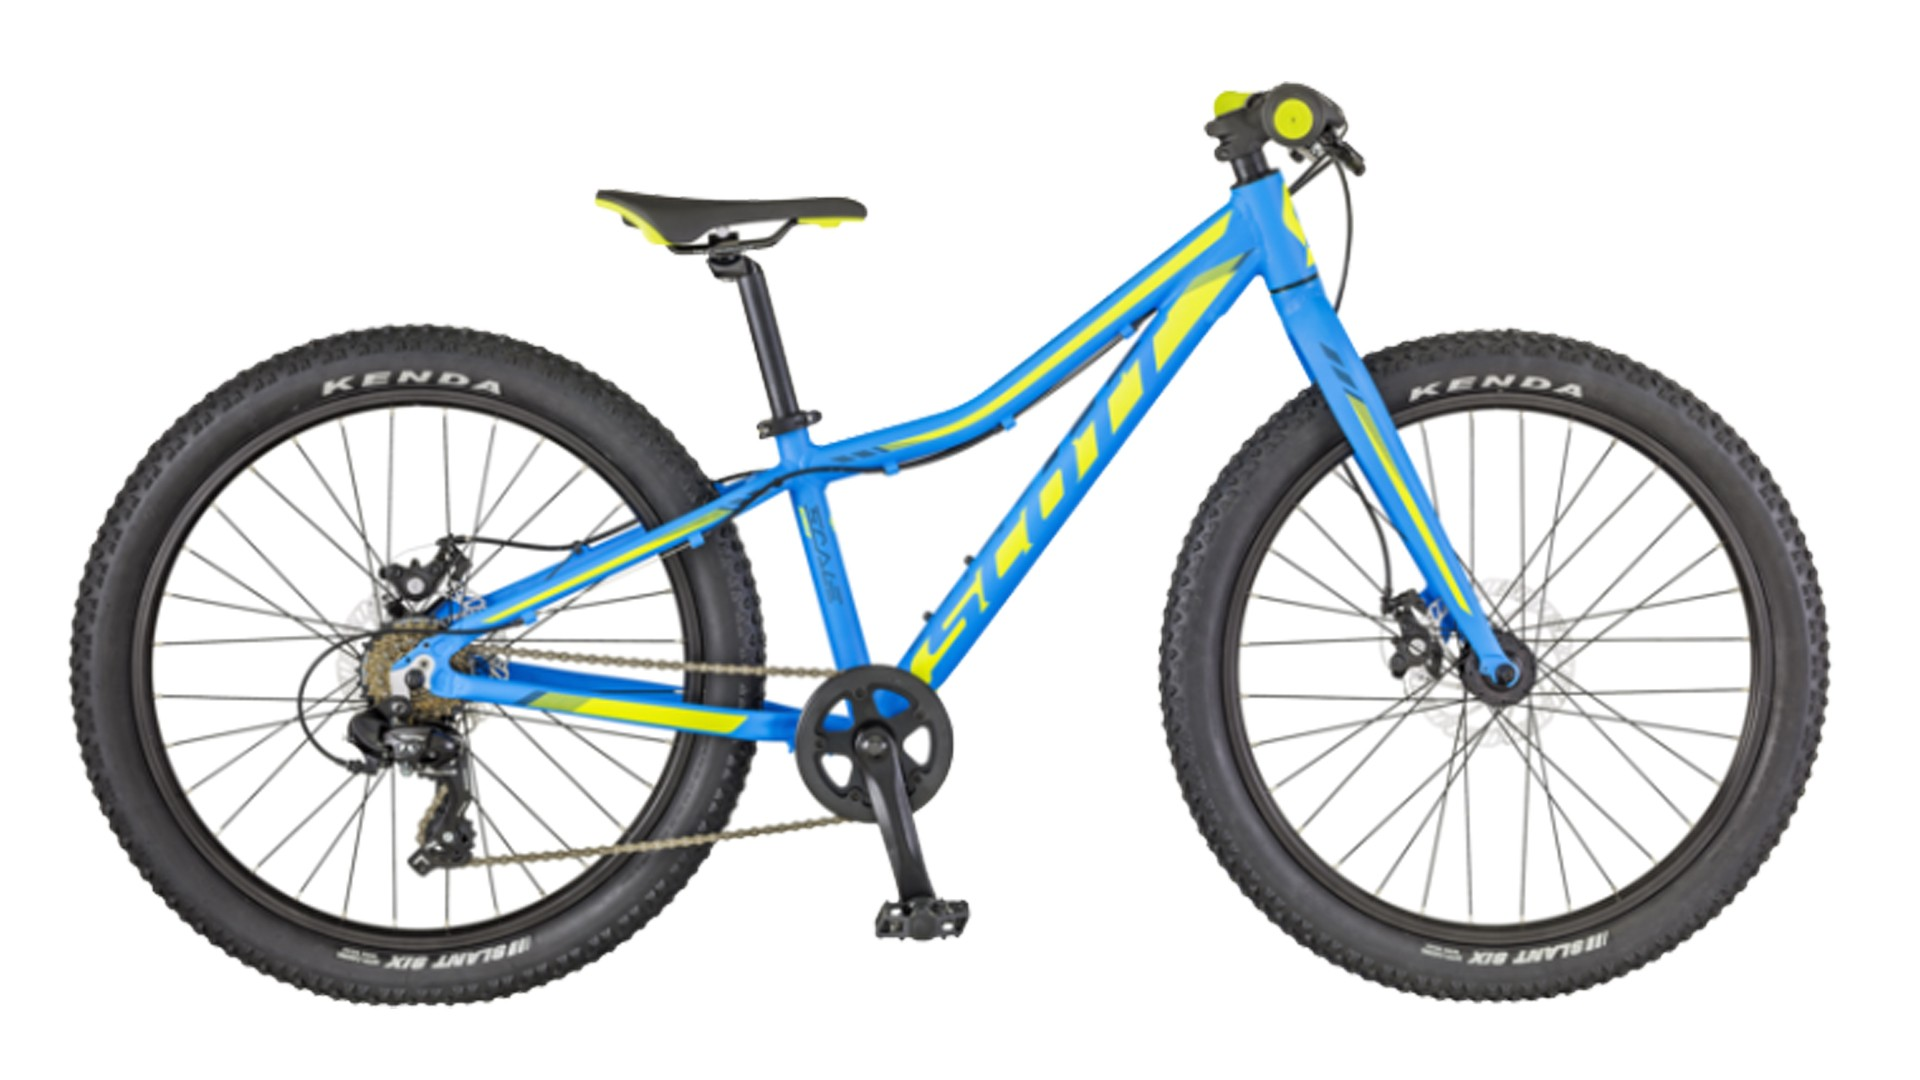 7fca070d0ed Best children s bikes  bikes and balance bikes for preschoolers ...